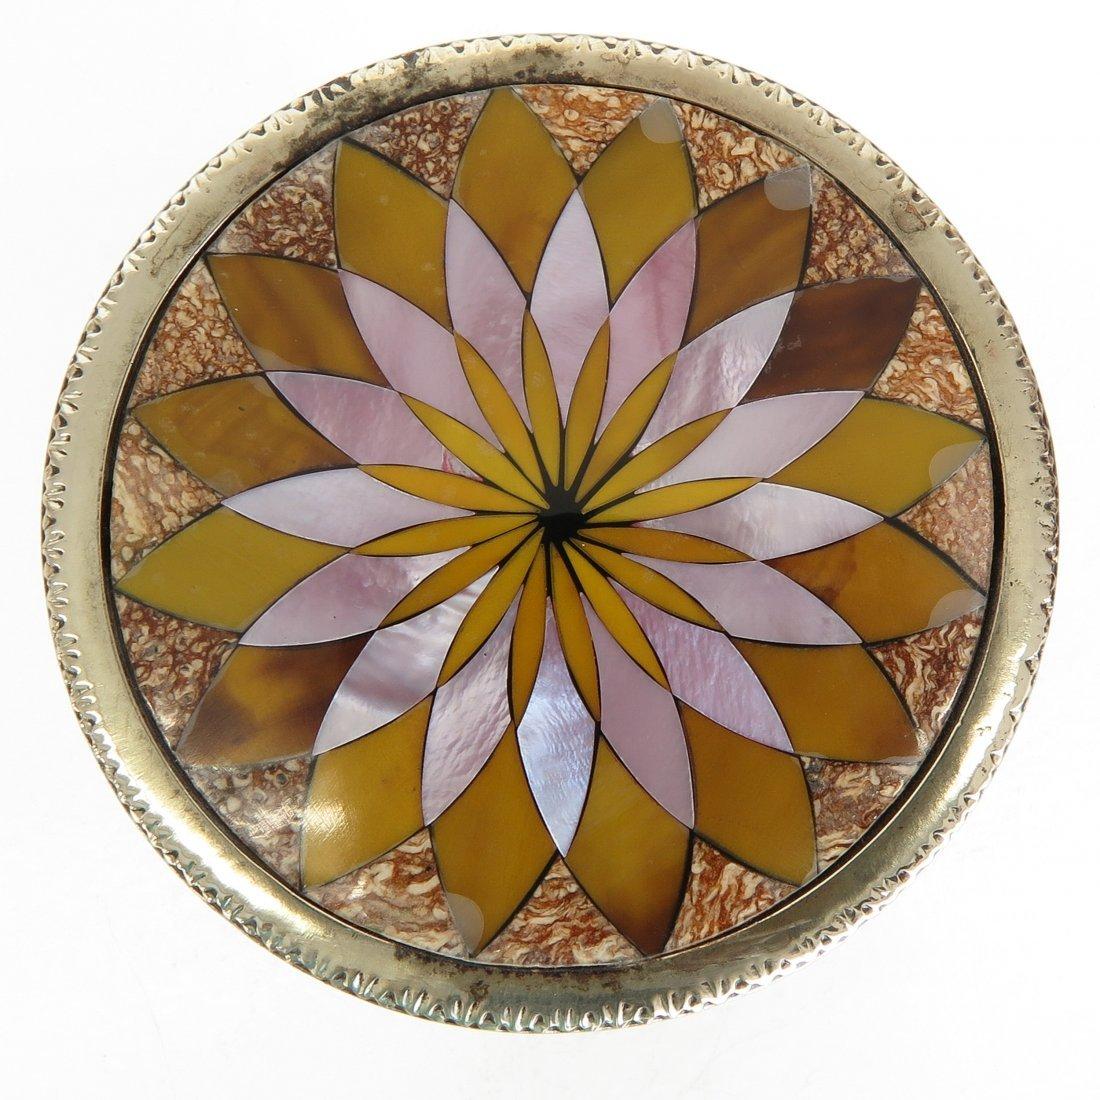 Miniature Pietra Dura Table - 3